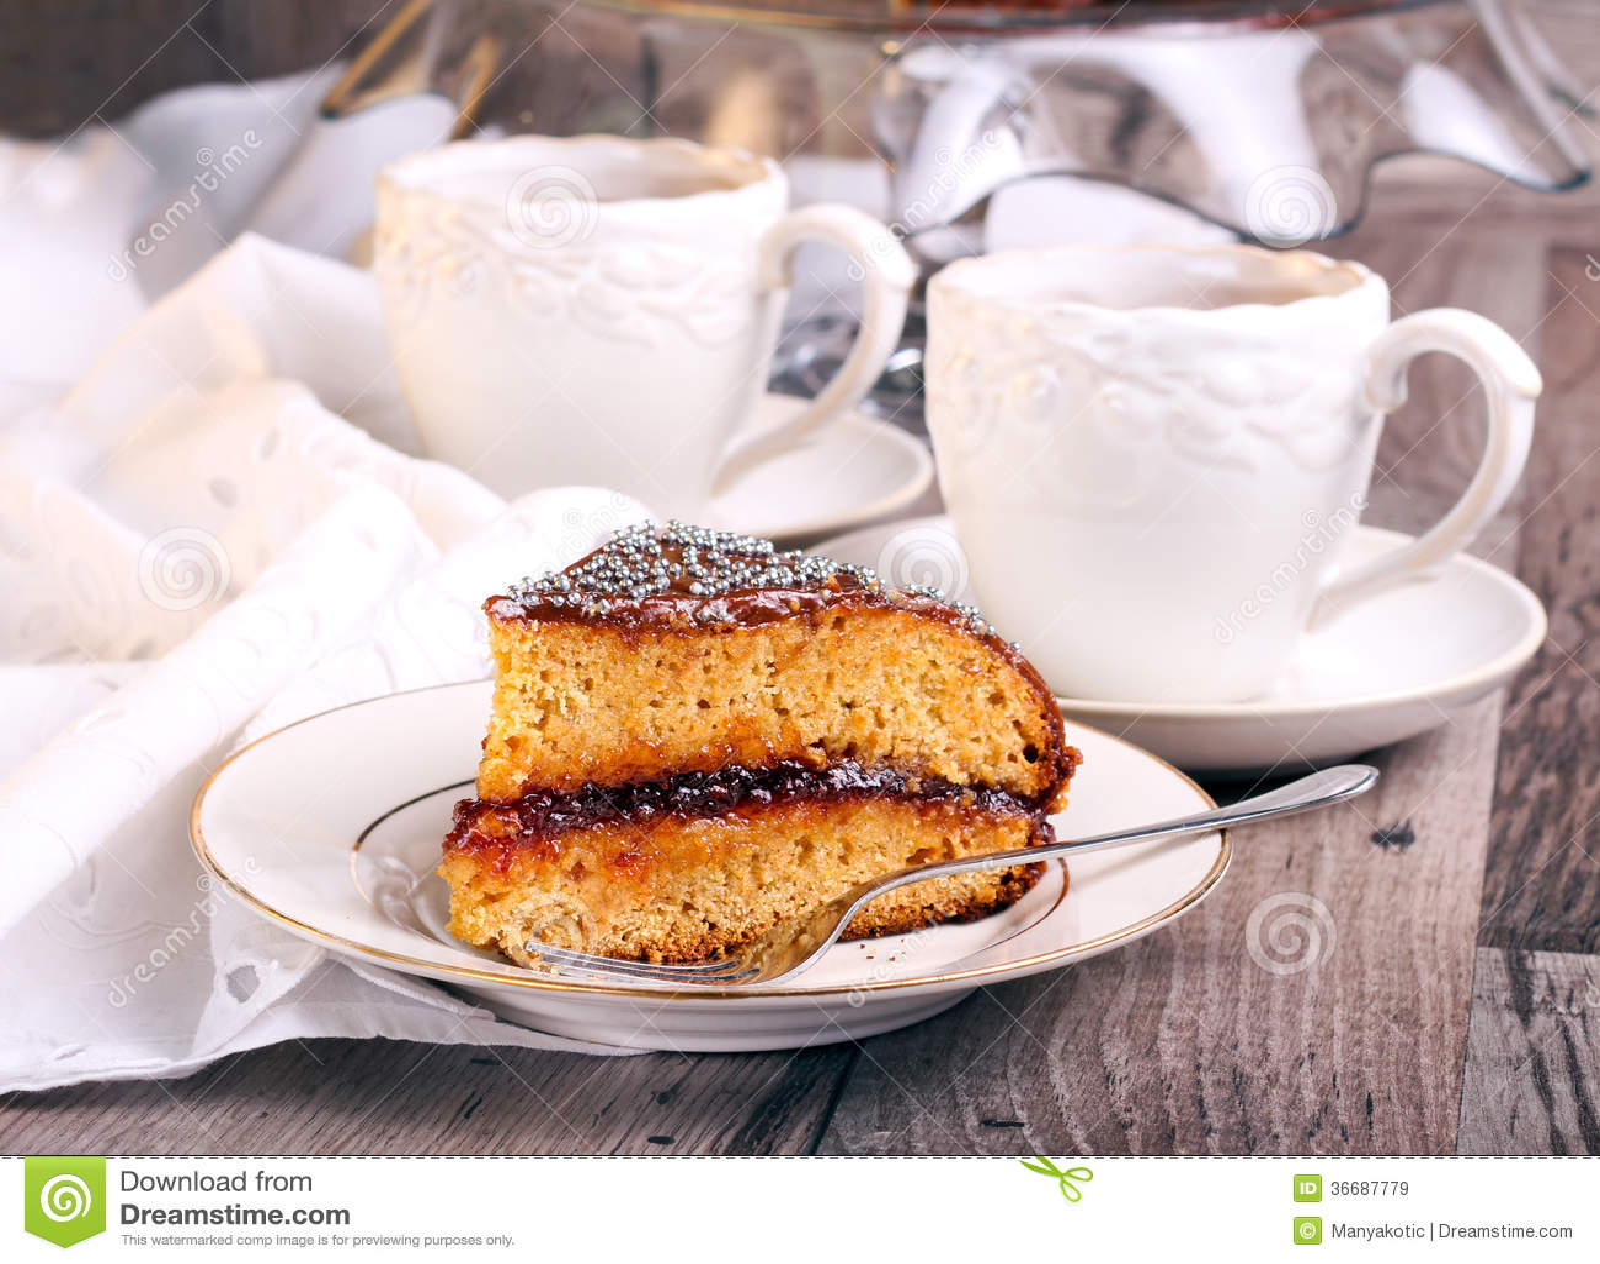 Jelly Glaze Recipe For Cake: Layer Spicy Cake With Jam Stock Image. Image Of Glaze